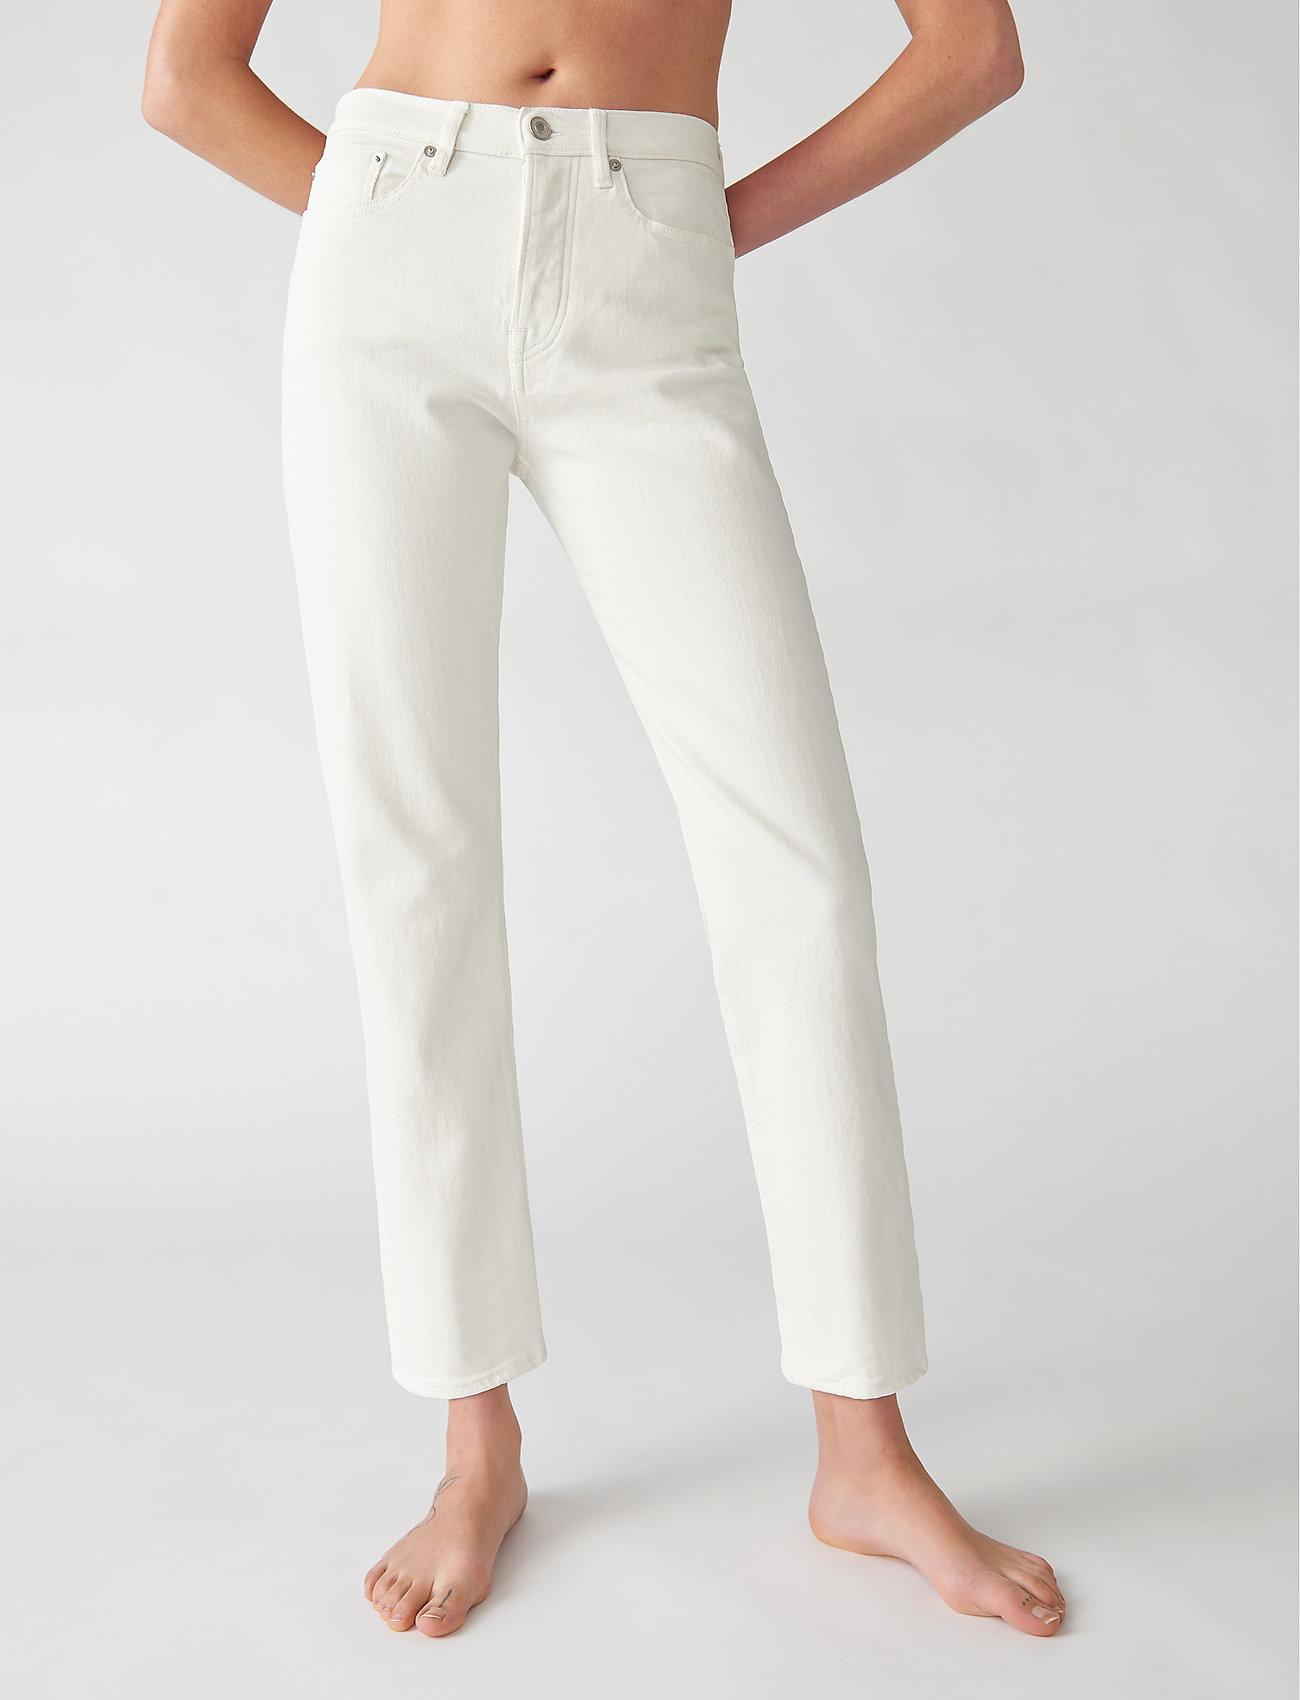 Jeanerica - CW002 - straight regular - natural white - 0